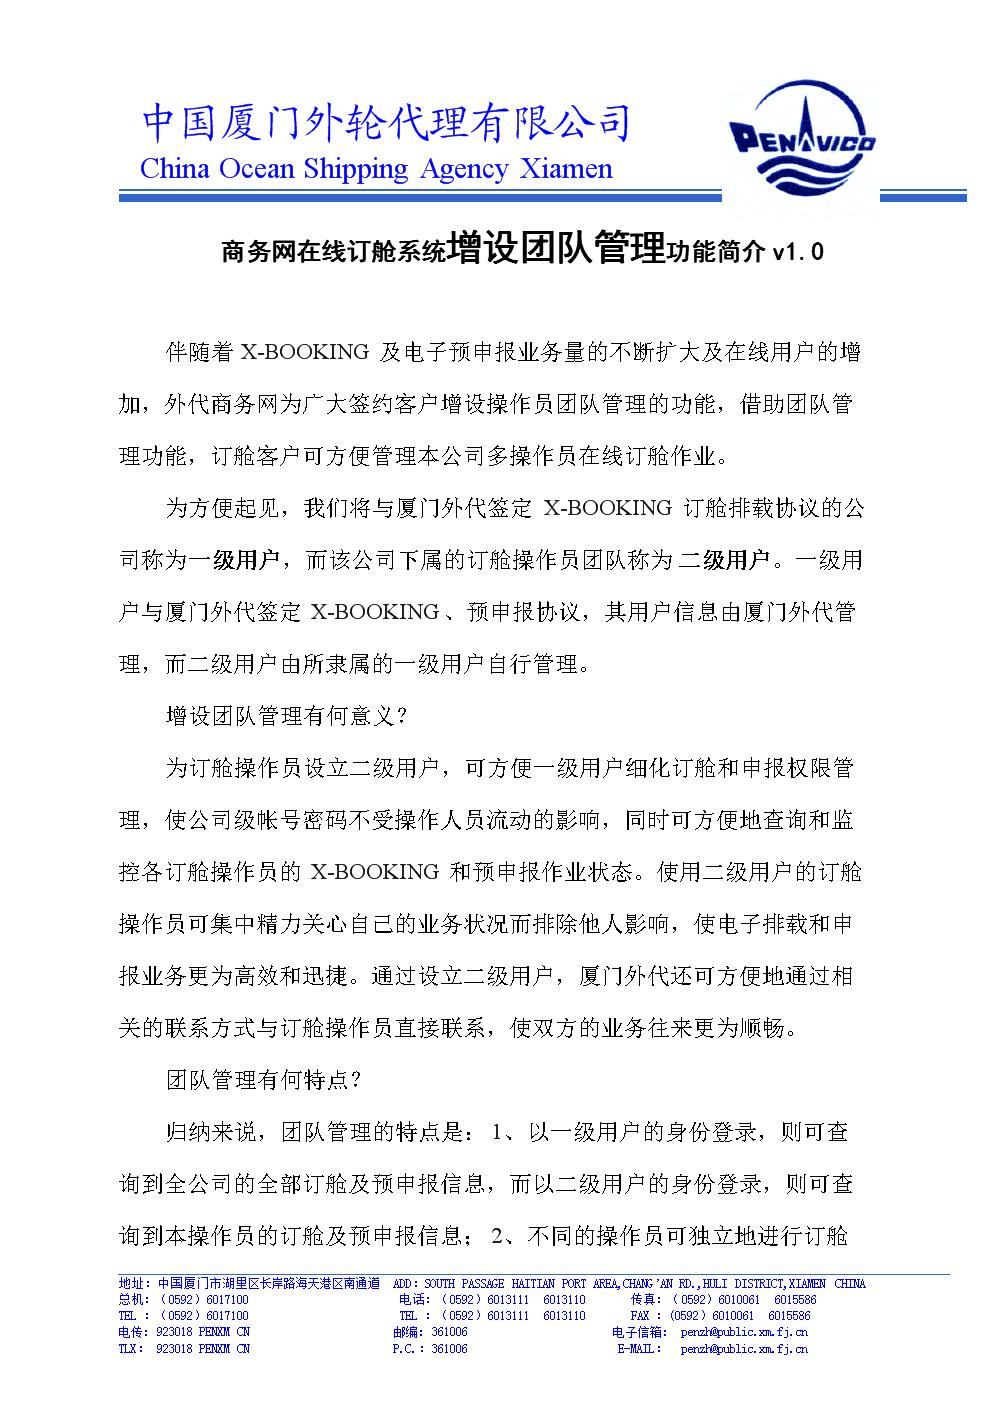 XBooking订舱_团队管理简介.doc